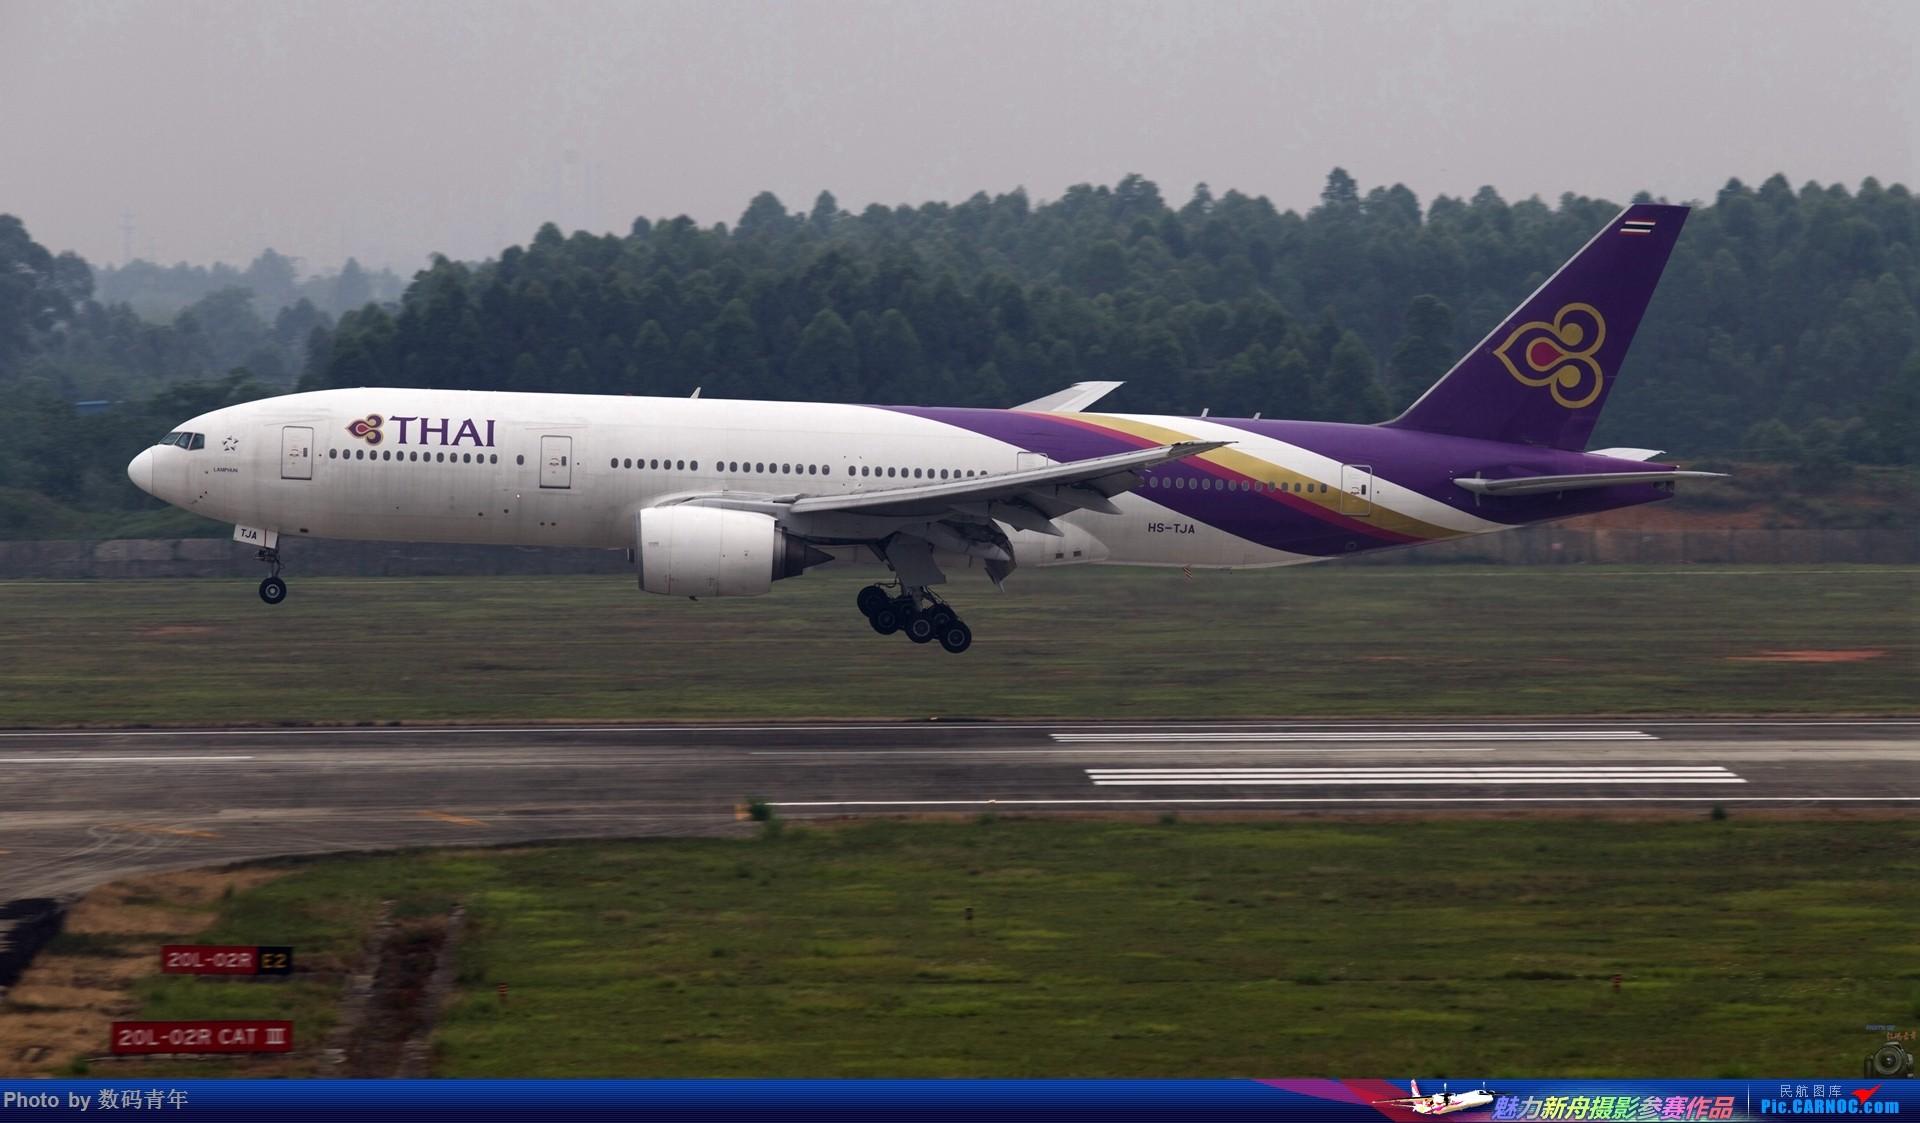 Re:[原创]重出江湖【CTU】2015.5.17打飞机 BOEING 777-200 HS-TJA 中国成都双流国际机场